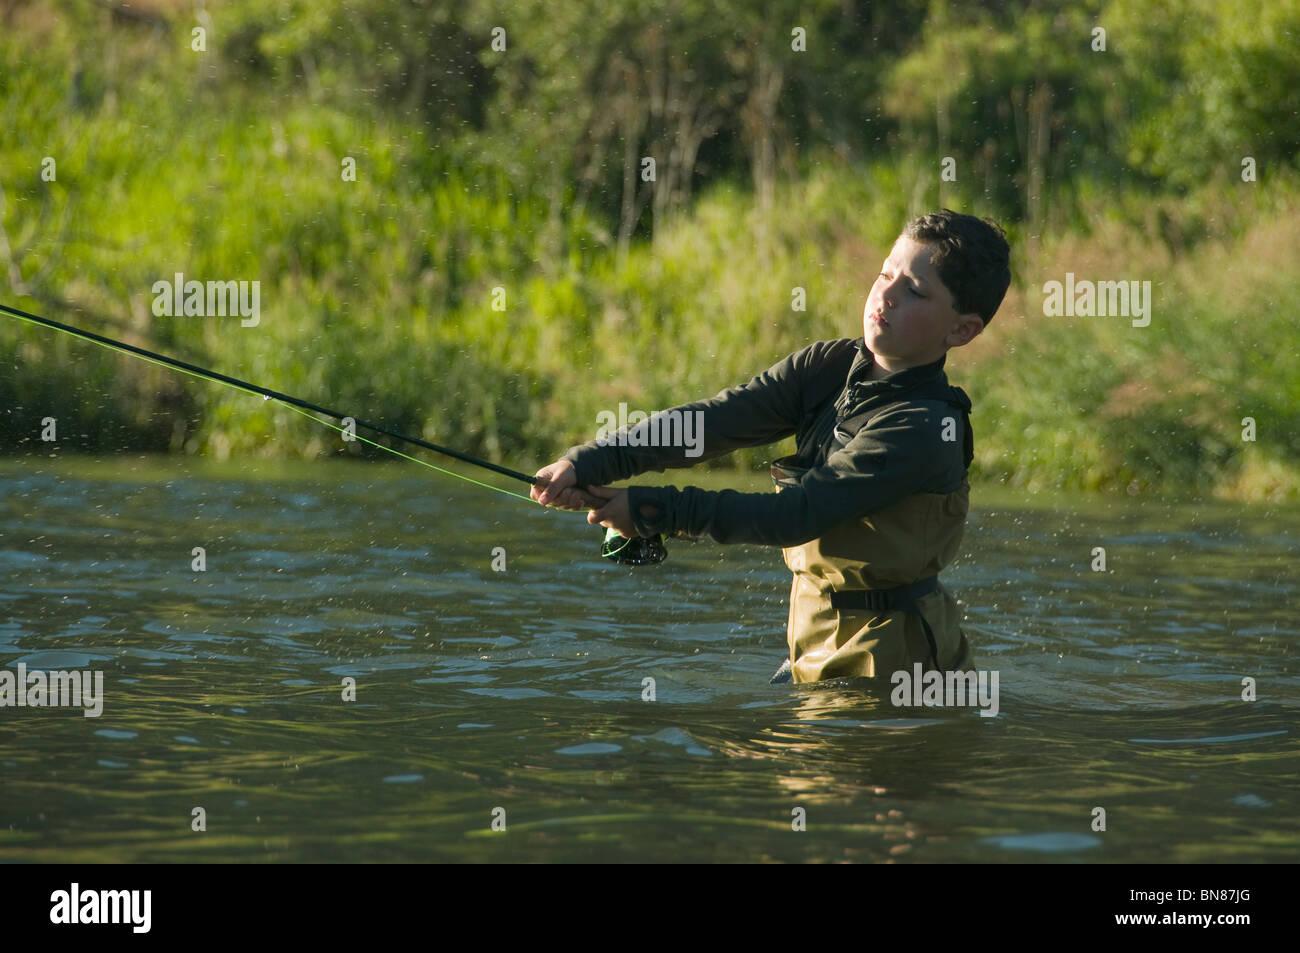 Boy, aged 8, fly-fishing, Deschutes River, Oregon - Stock Image